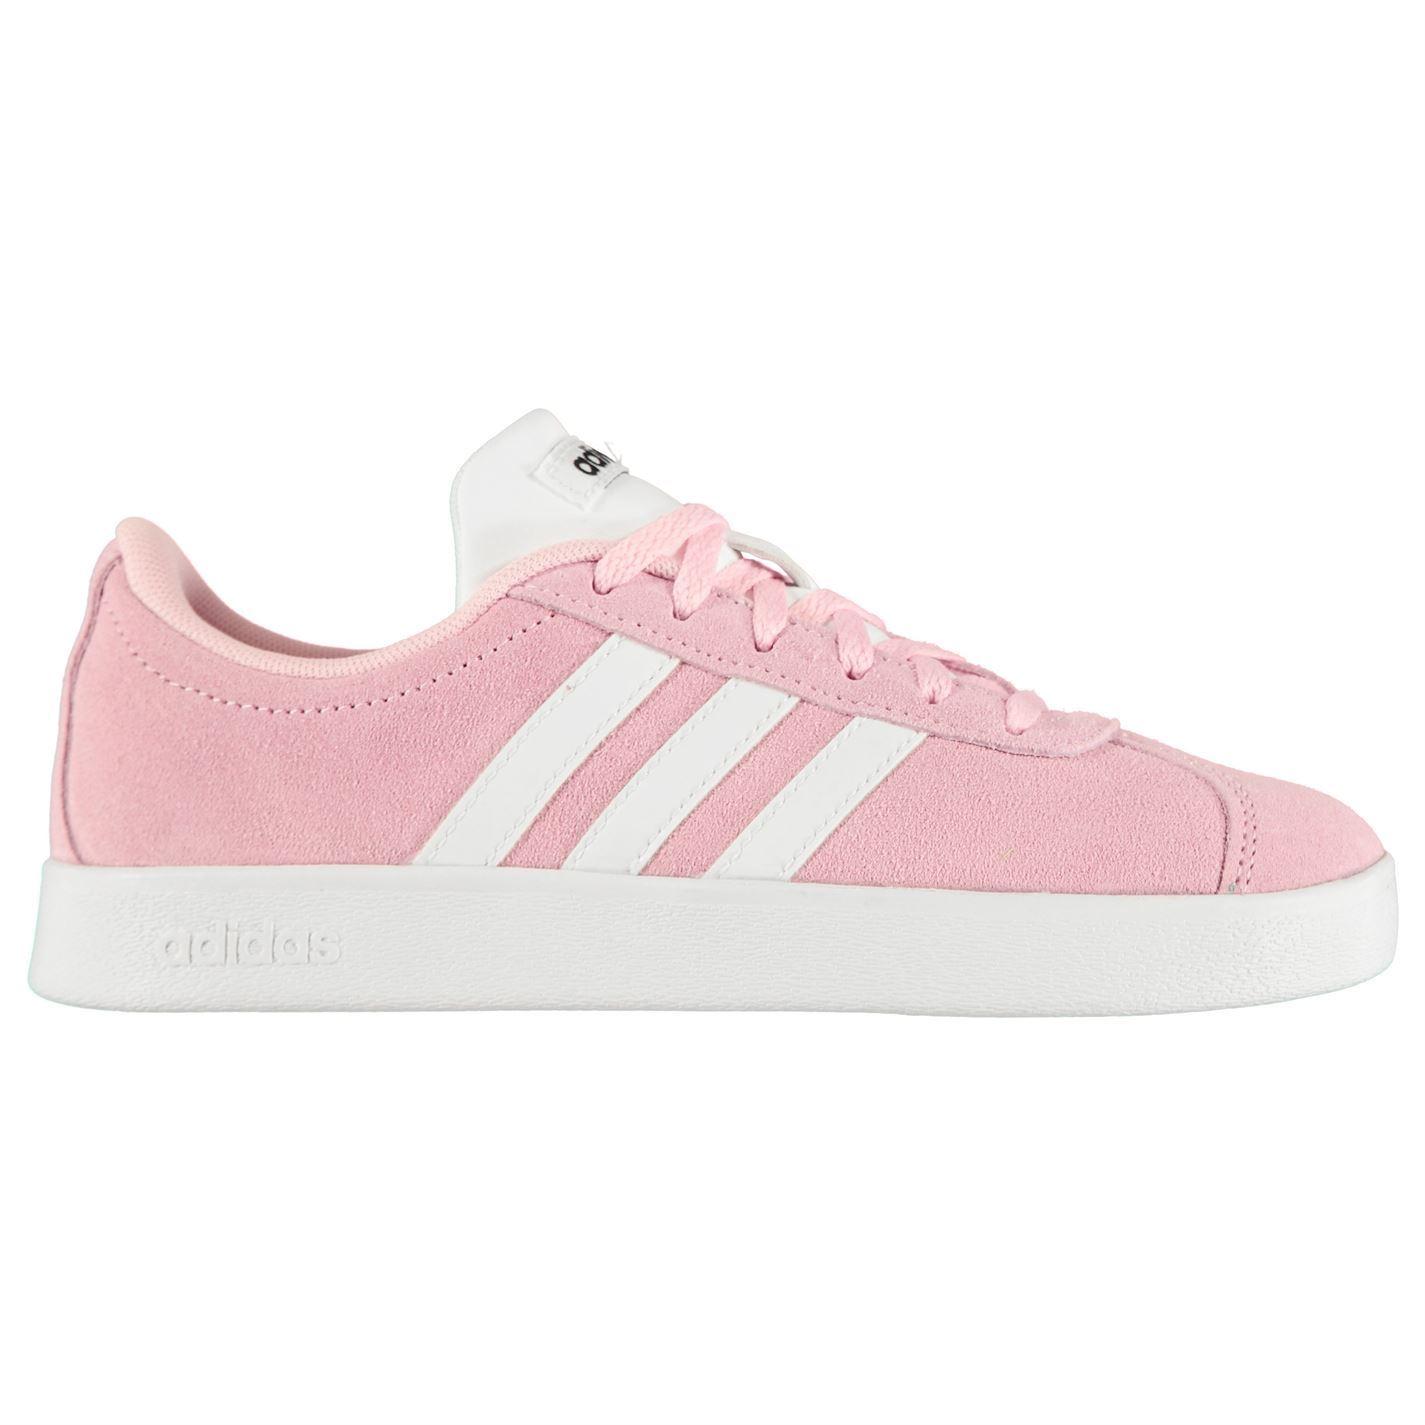 ladies pink suede trainers online shop